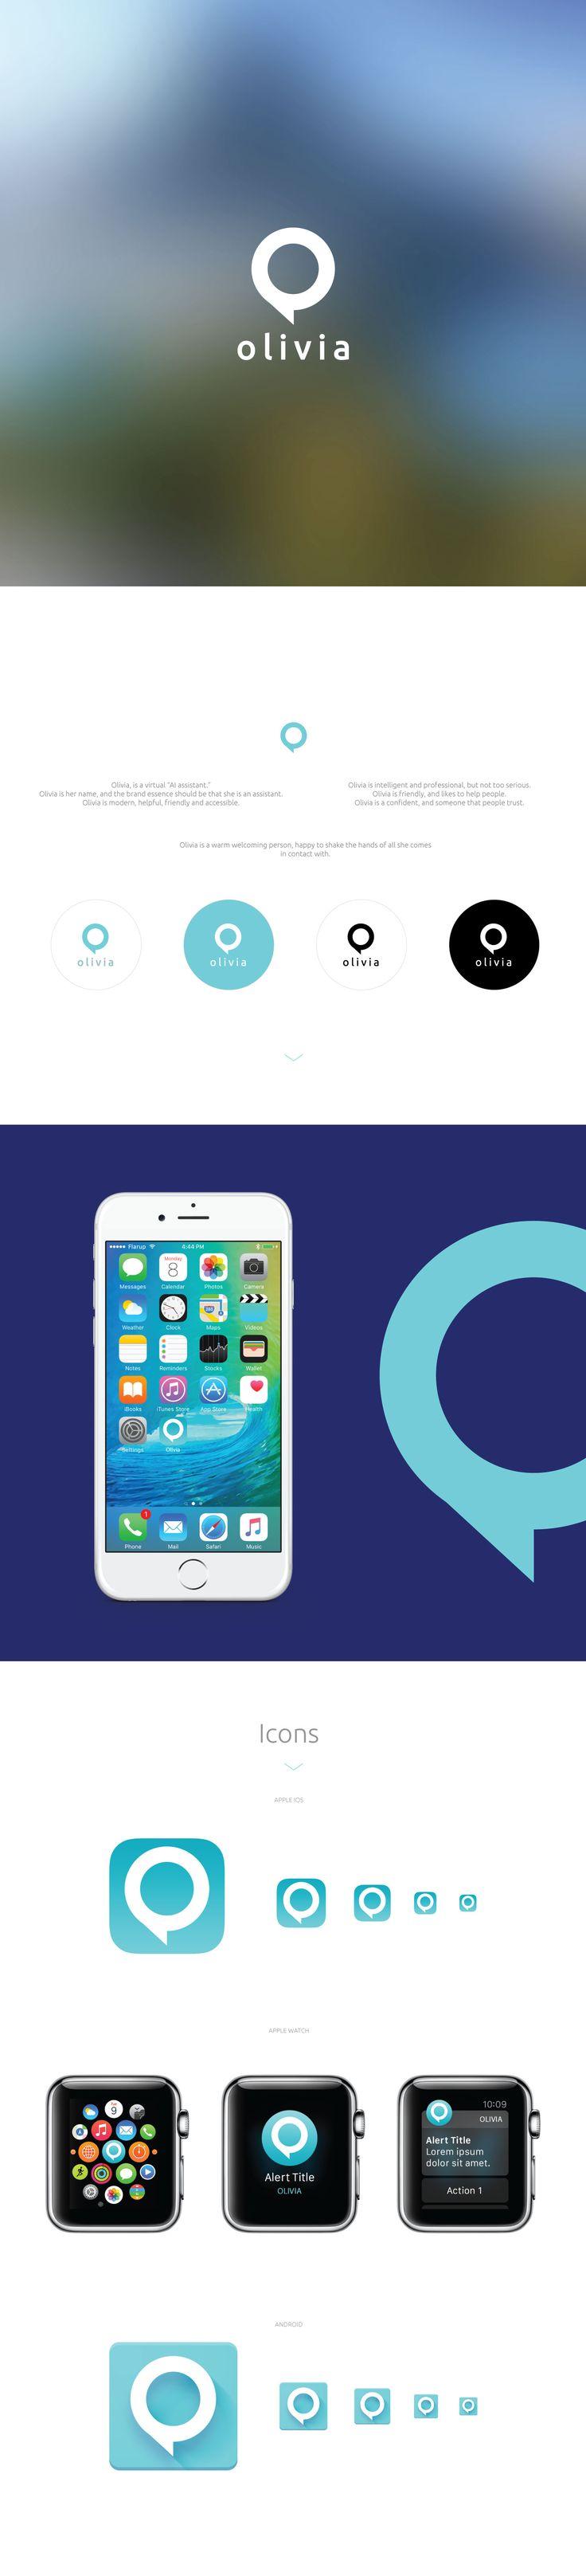 App Icon and logo design.